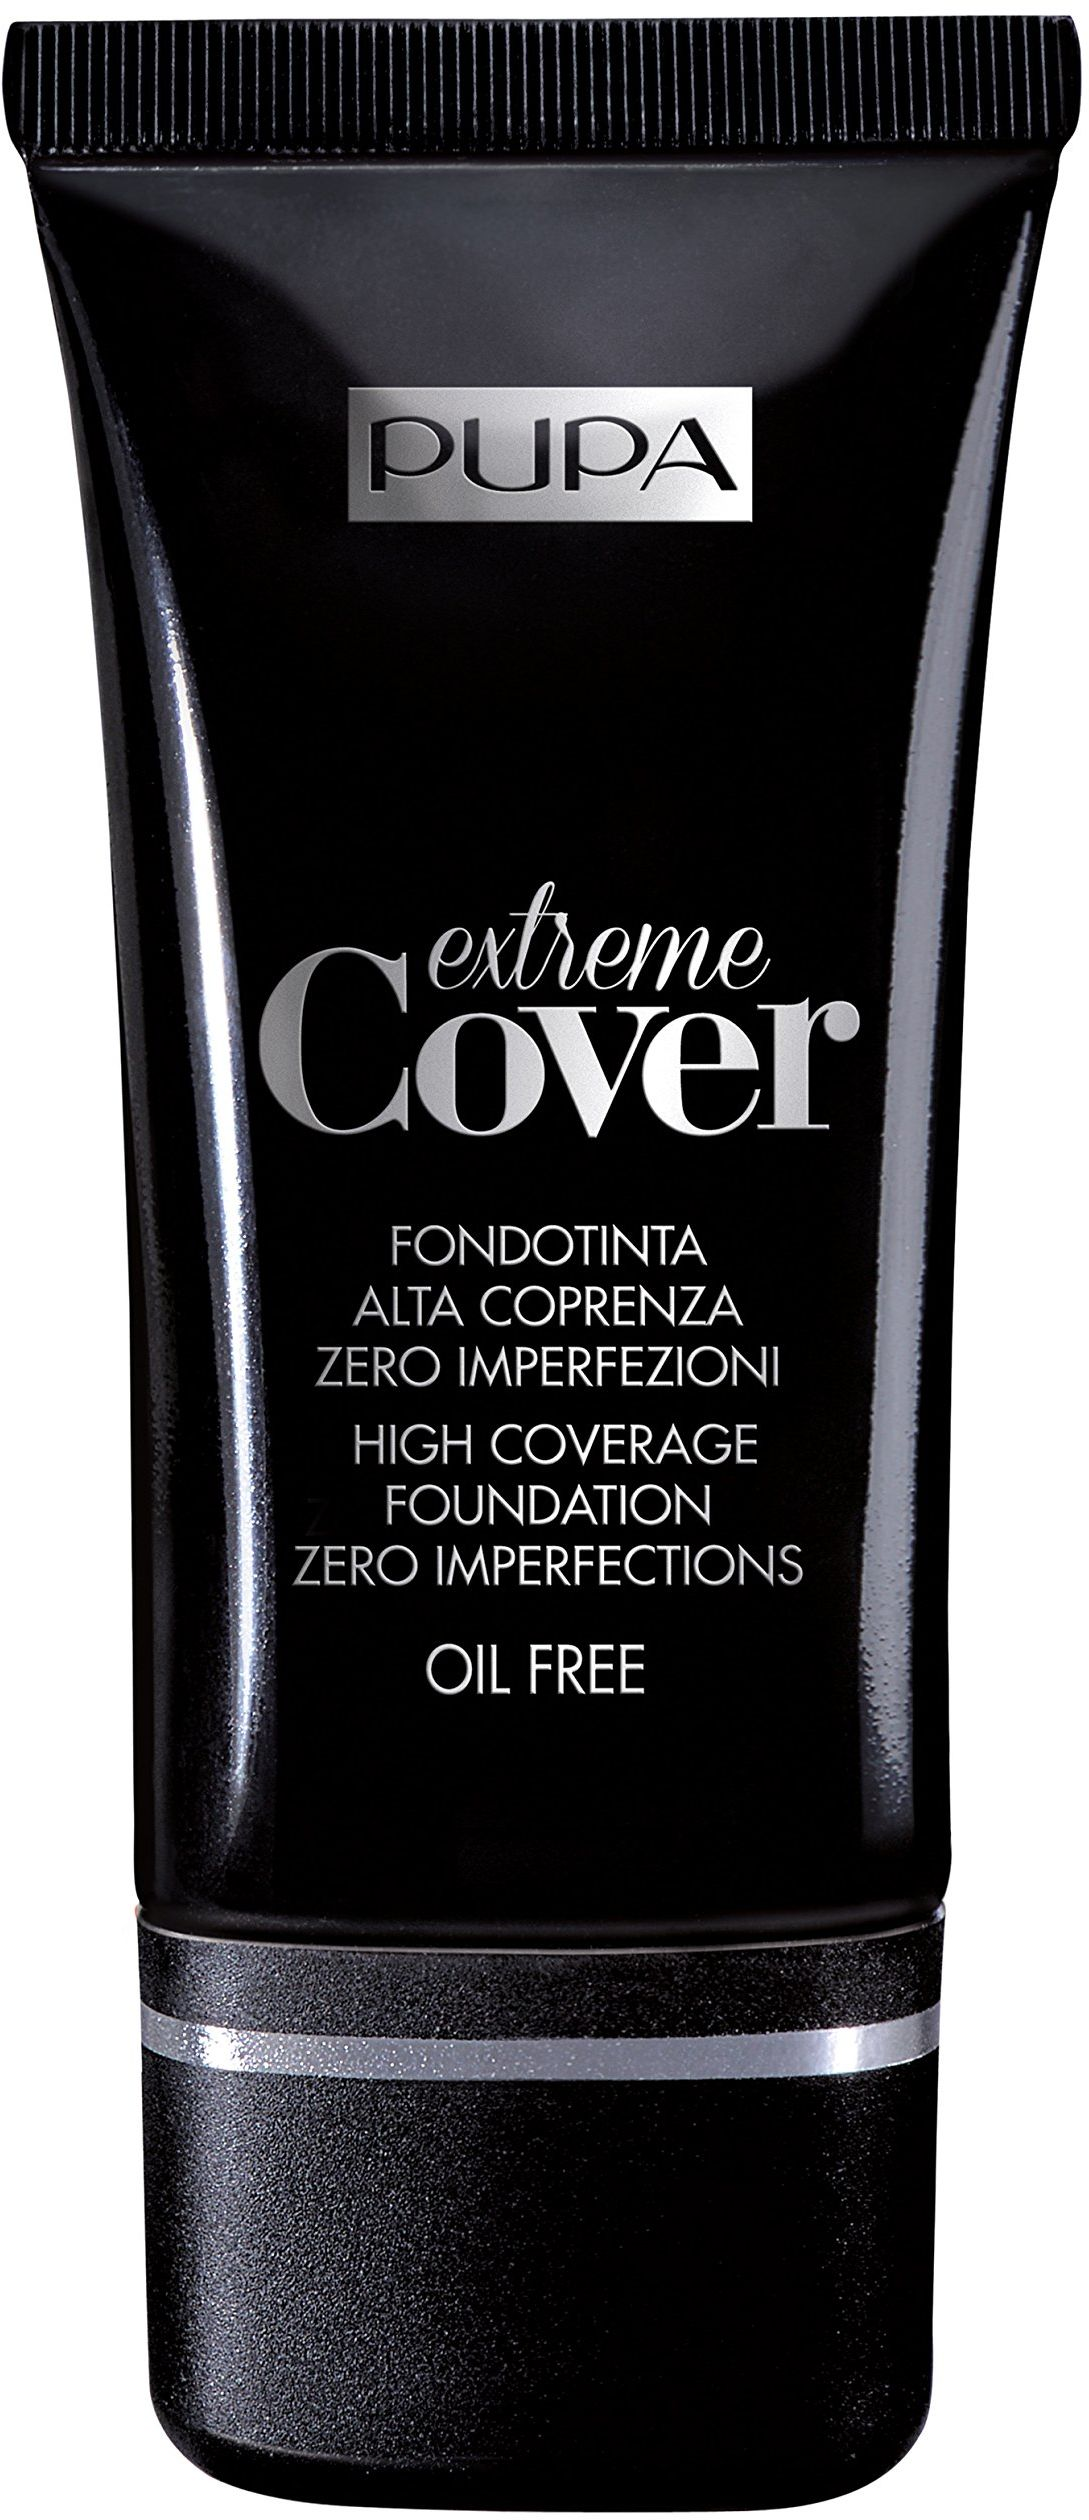 Pupa Extreme Cover Fondotinta, N. 030 jasny piasek